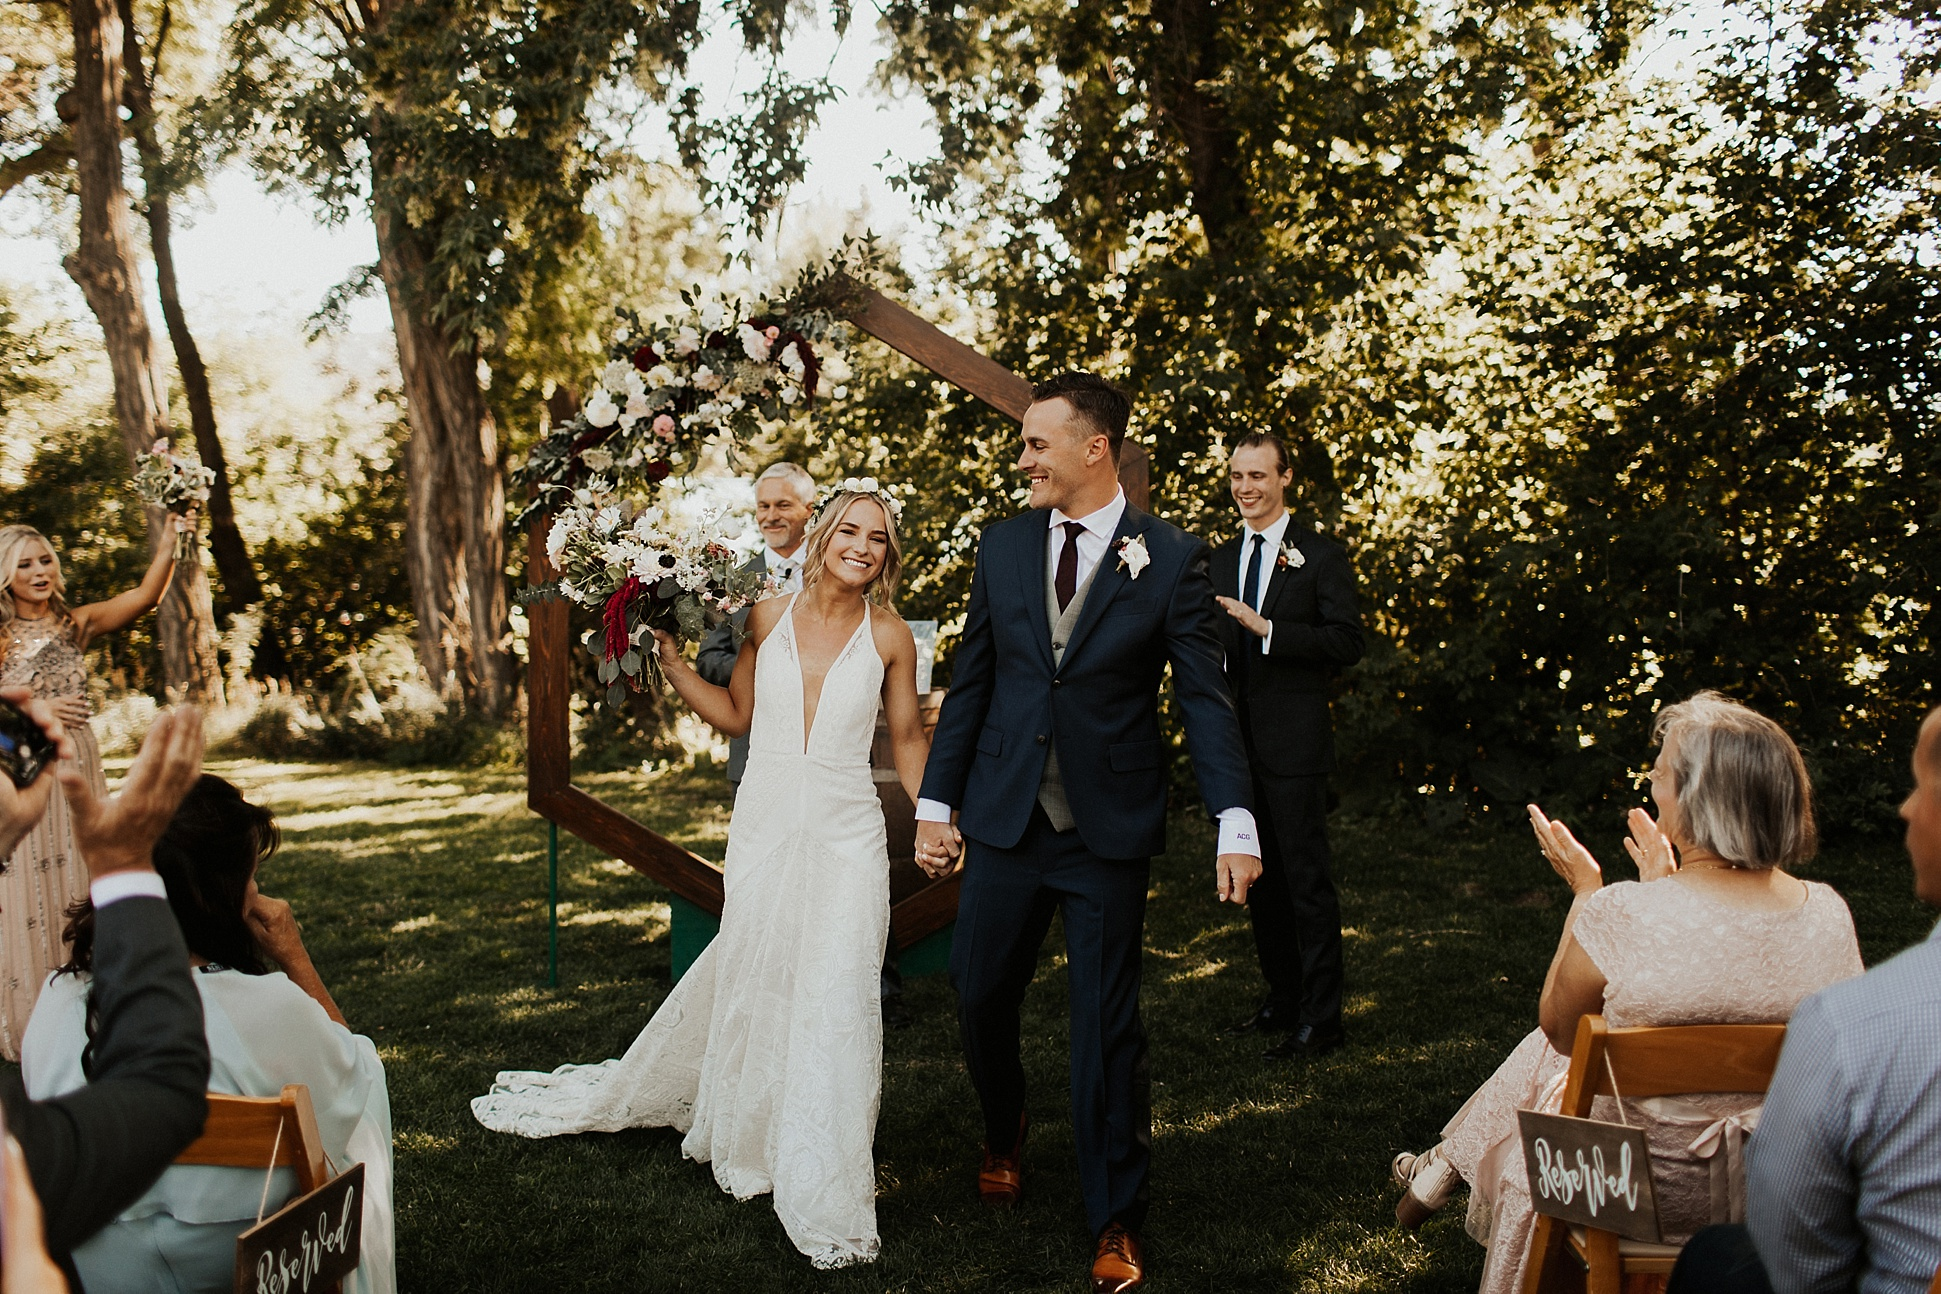 lyons_farmette_colorado_wedding004.JPG